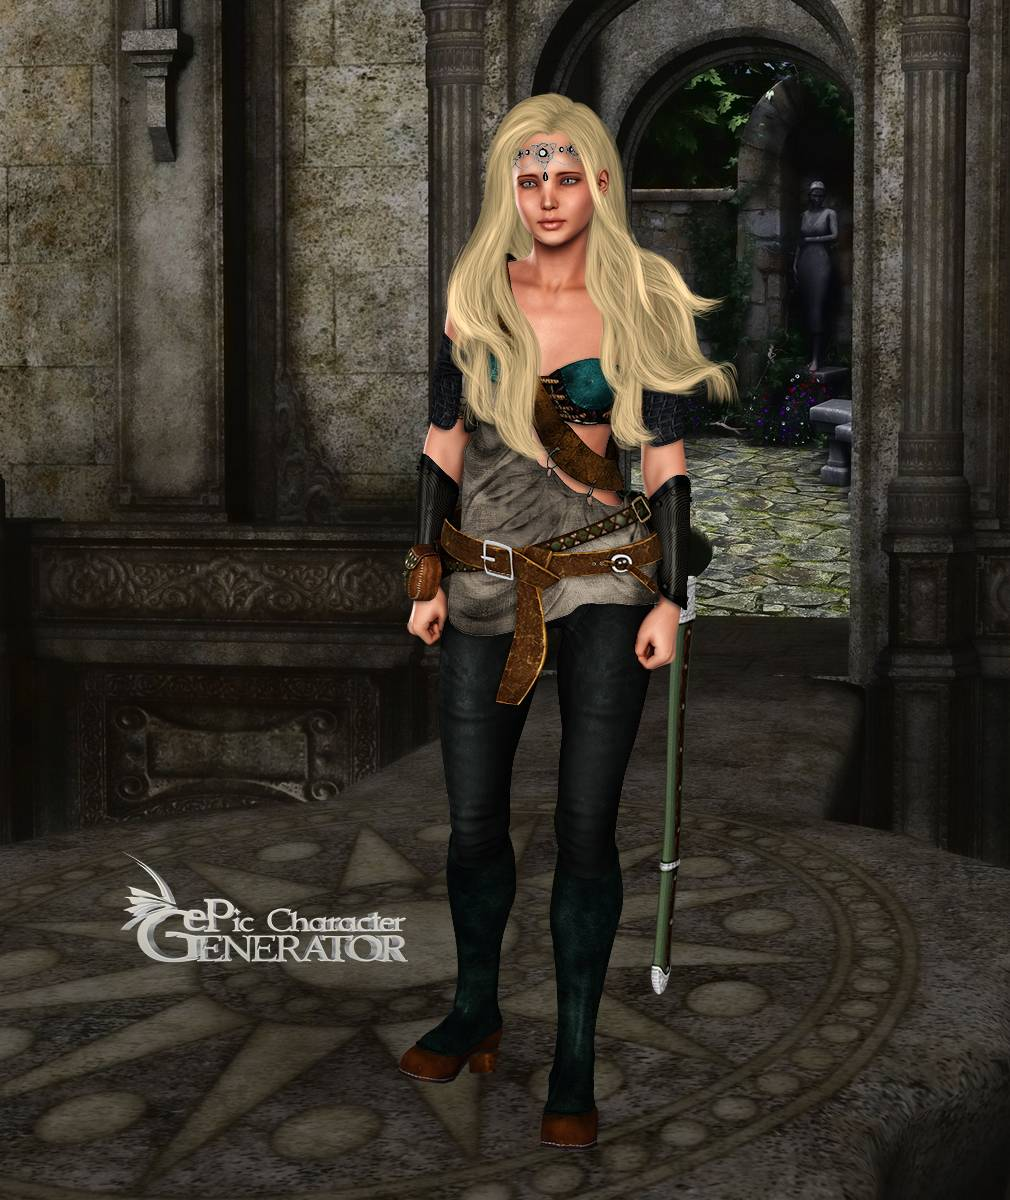 ePic Character Generator Season 2 Female Adventurer 2 Screenshot 07